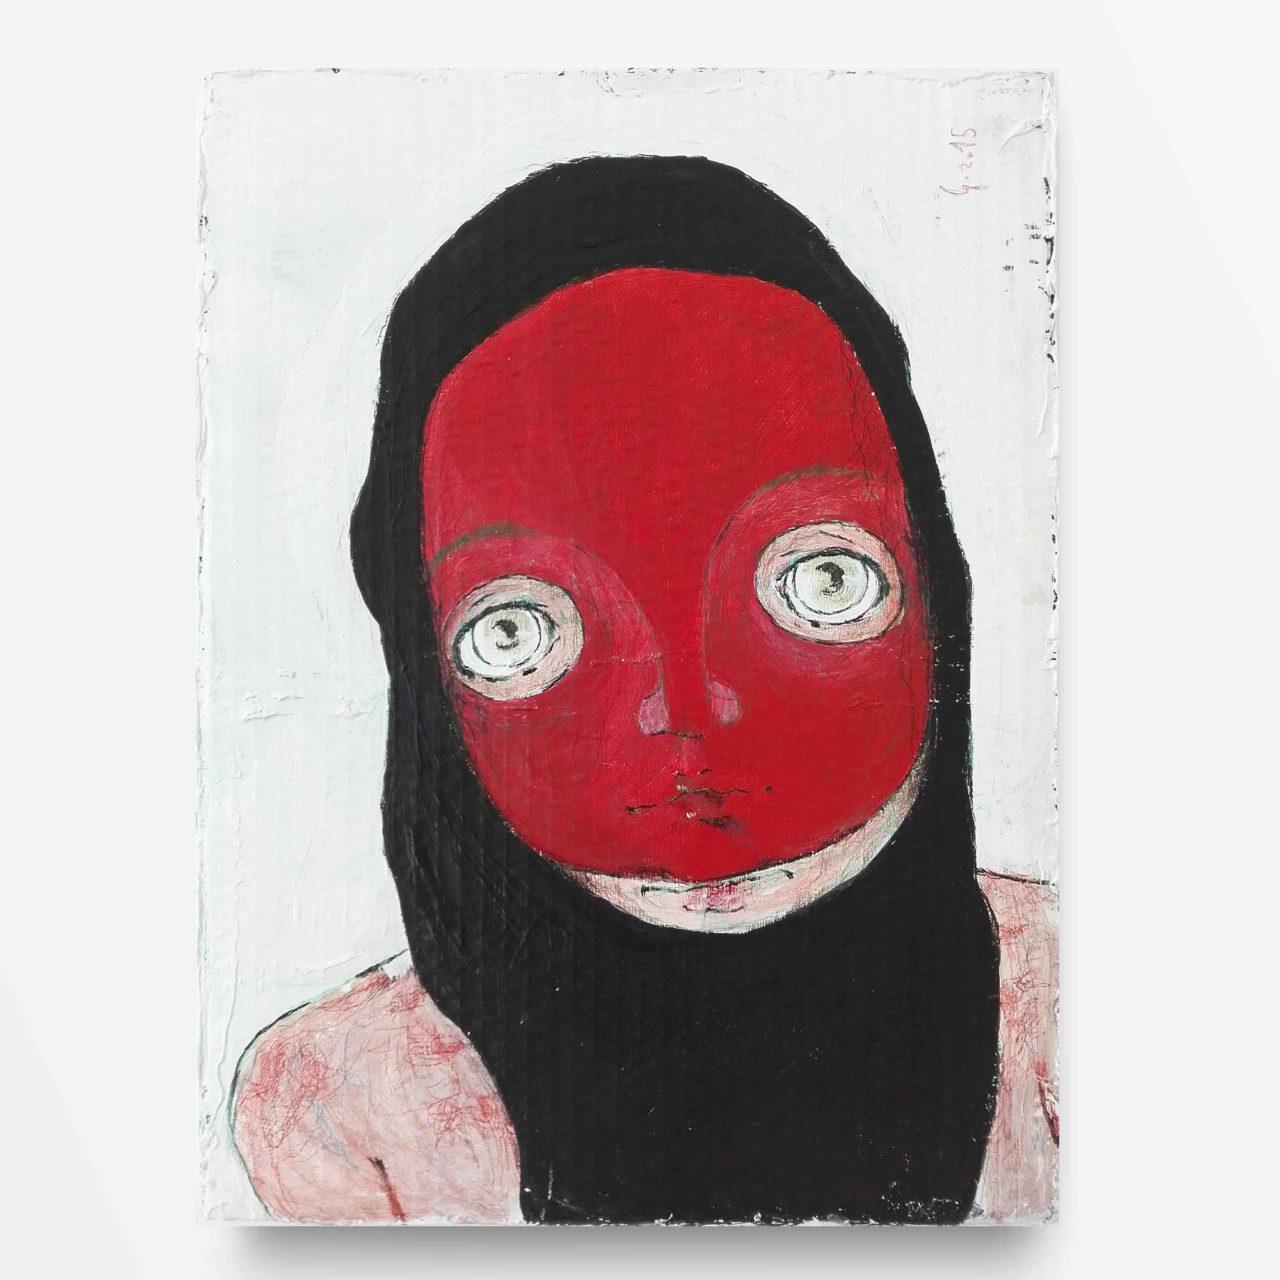 2015 Burnout Maschera Rossa Pittura Contemporanea Diego Gabriele